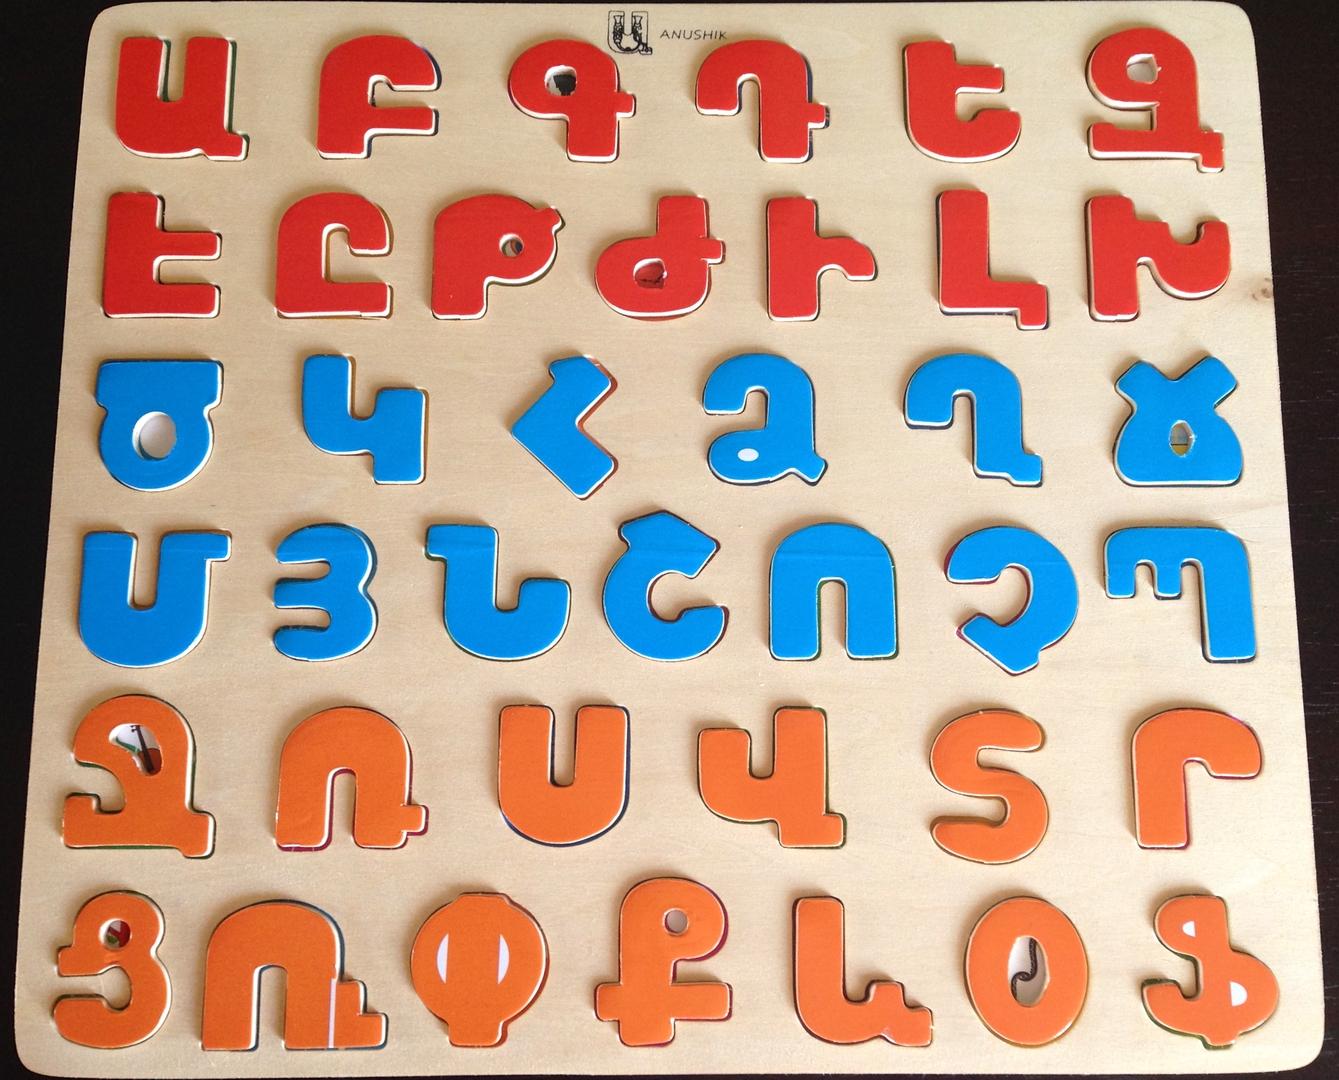 Anushik Armenian Alphabet Wooden Letters Gifts Abrilbooks